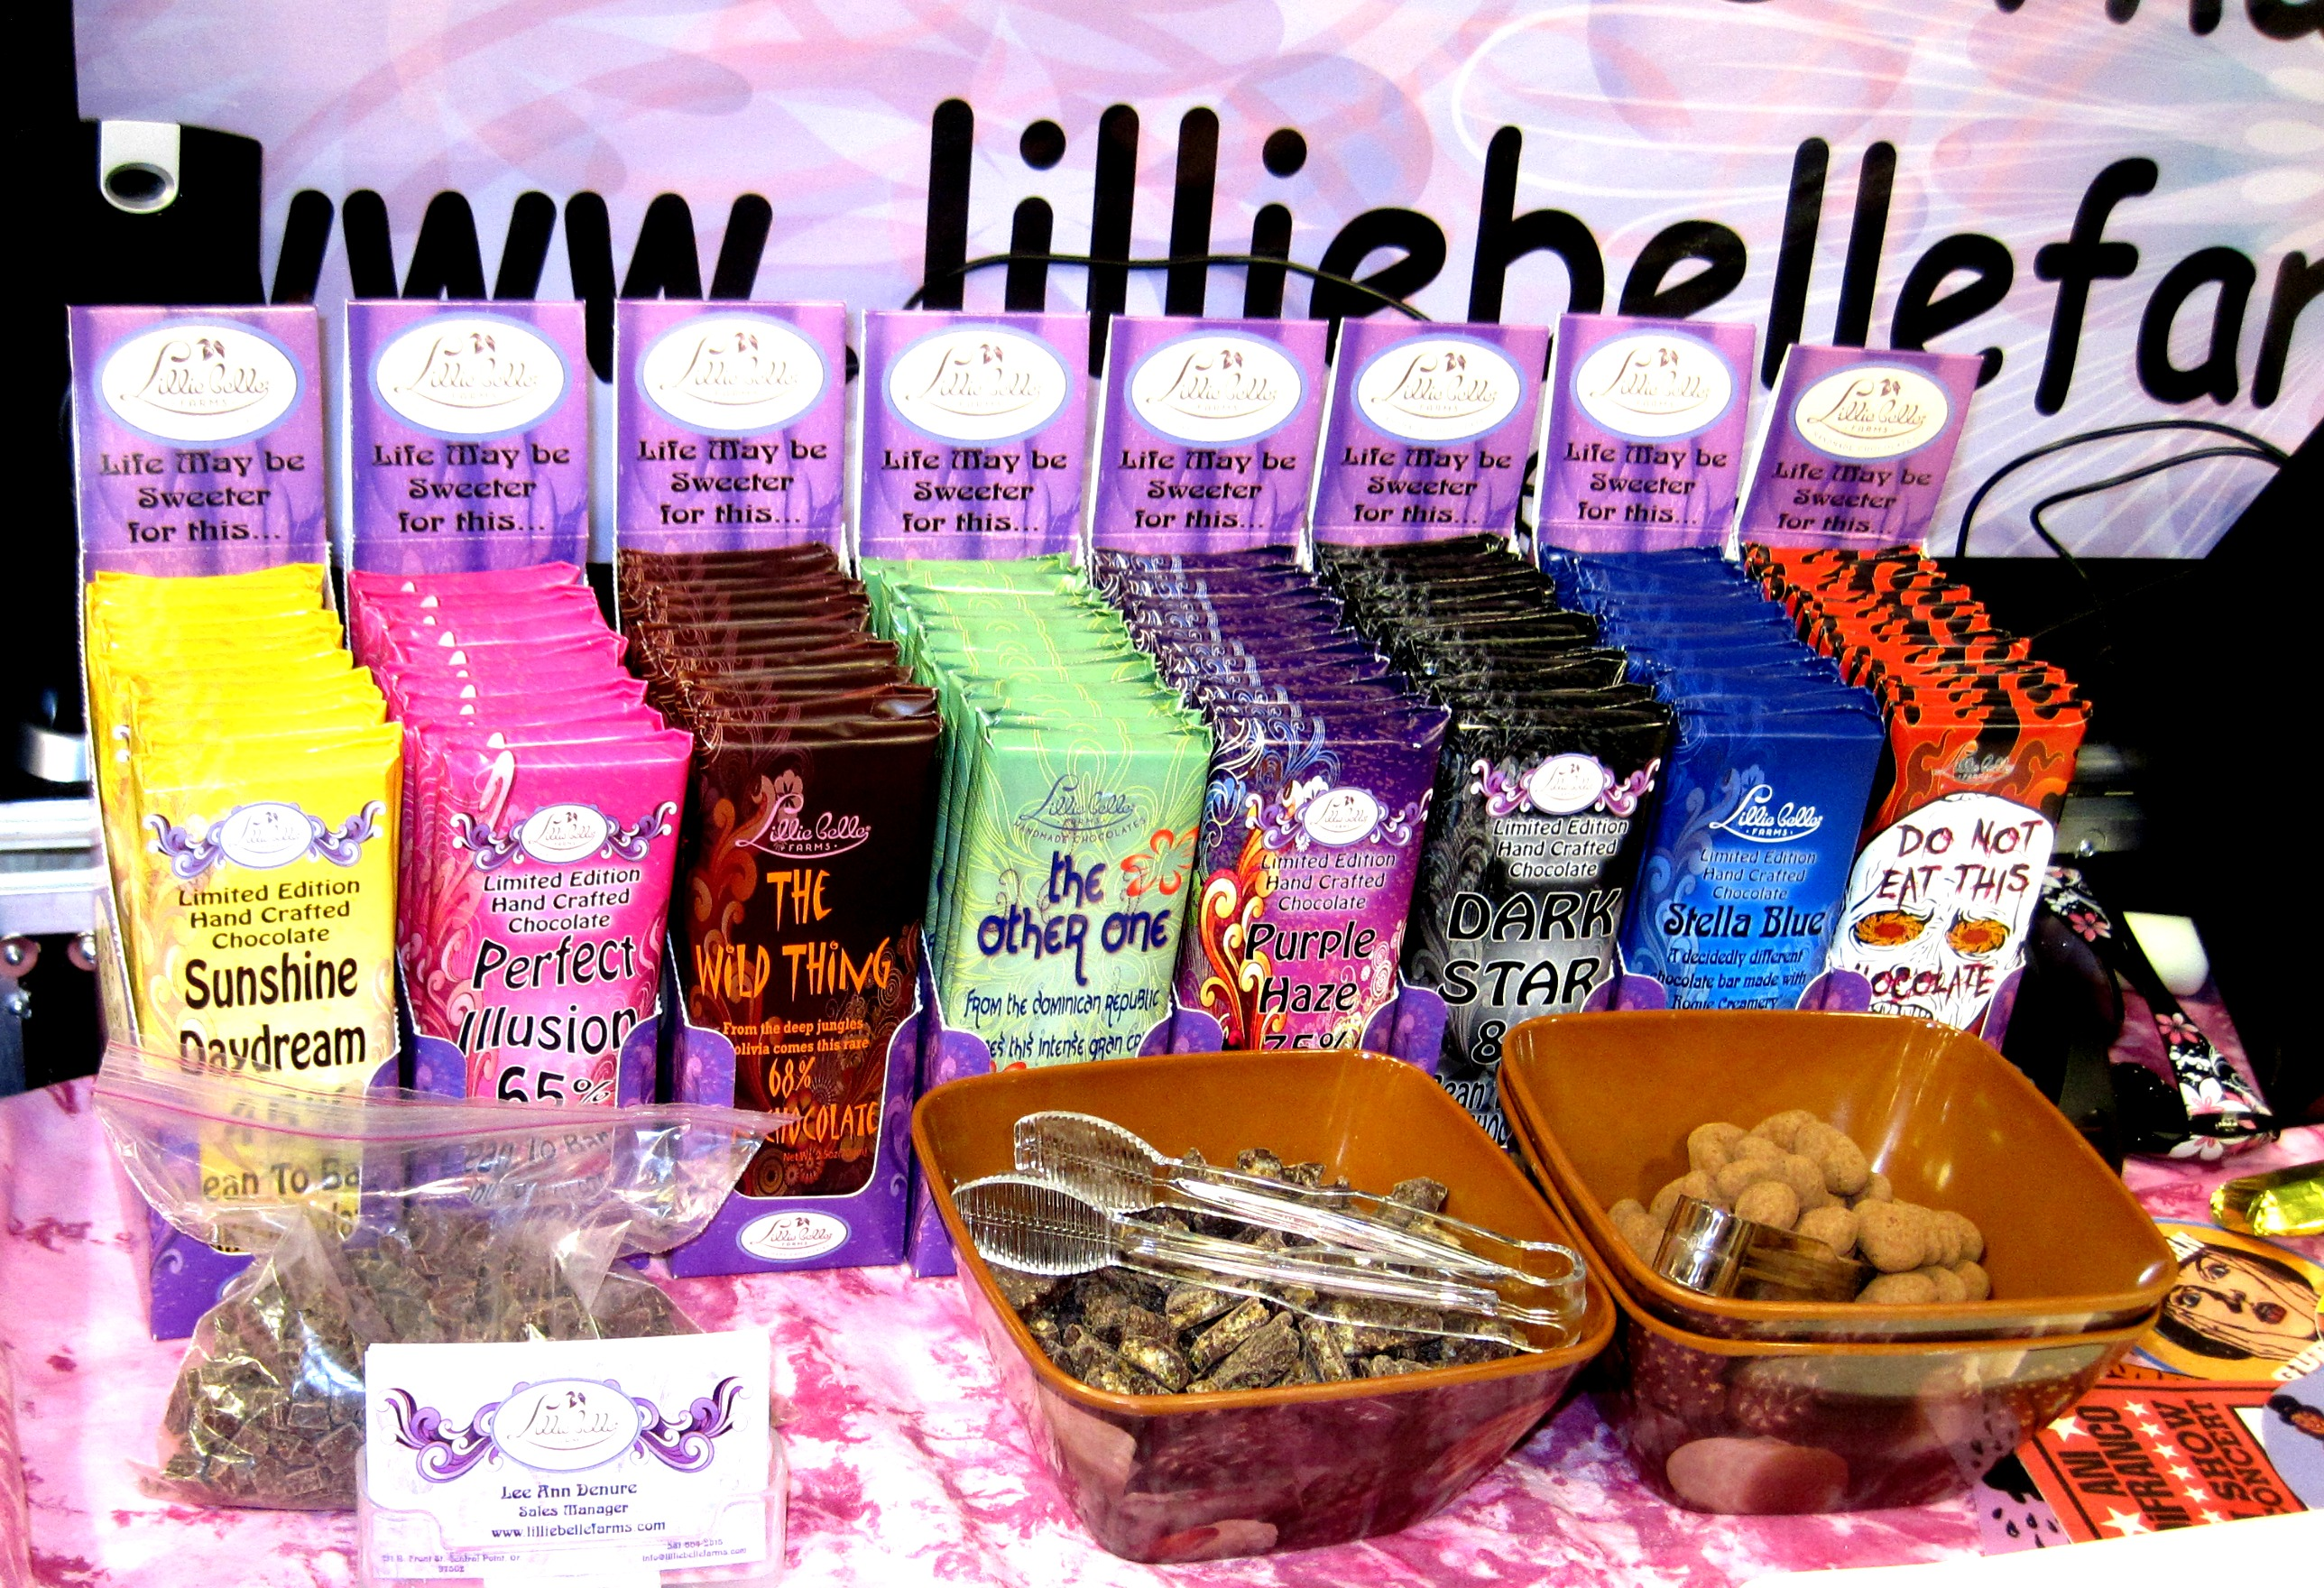 lilliebellefarmschocolate_expowest